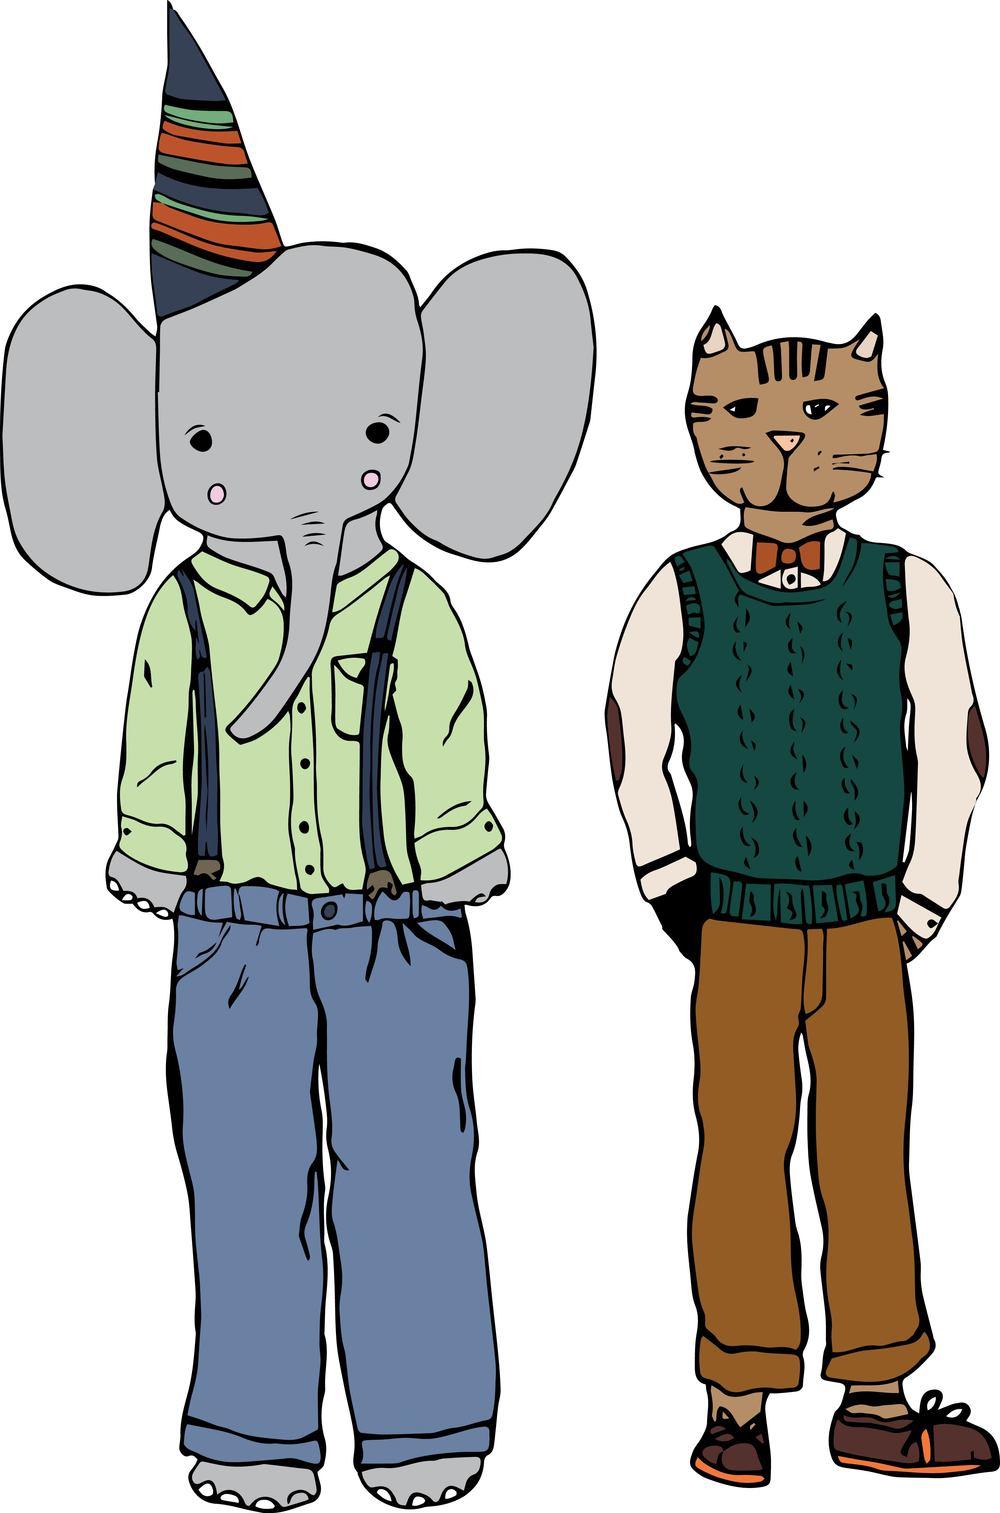 Cat and Elephant Thumbnail.jpg